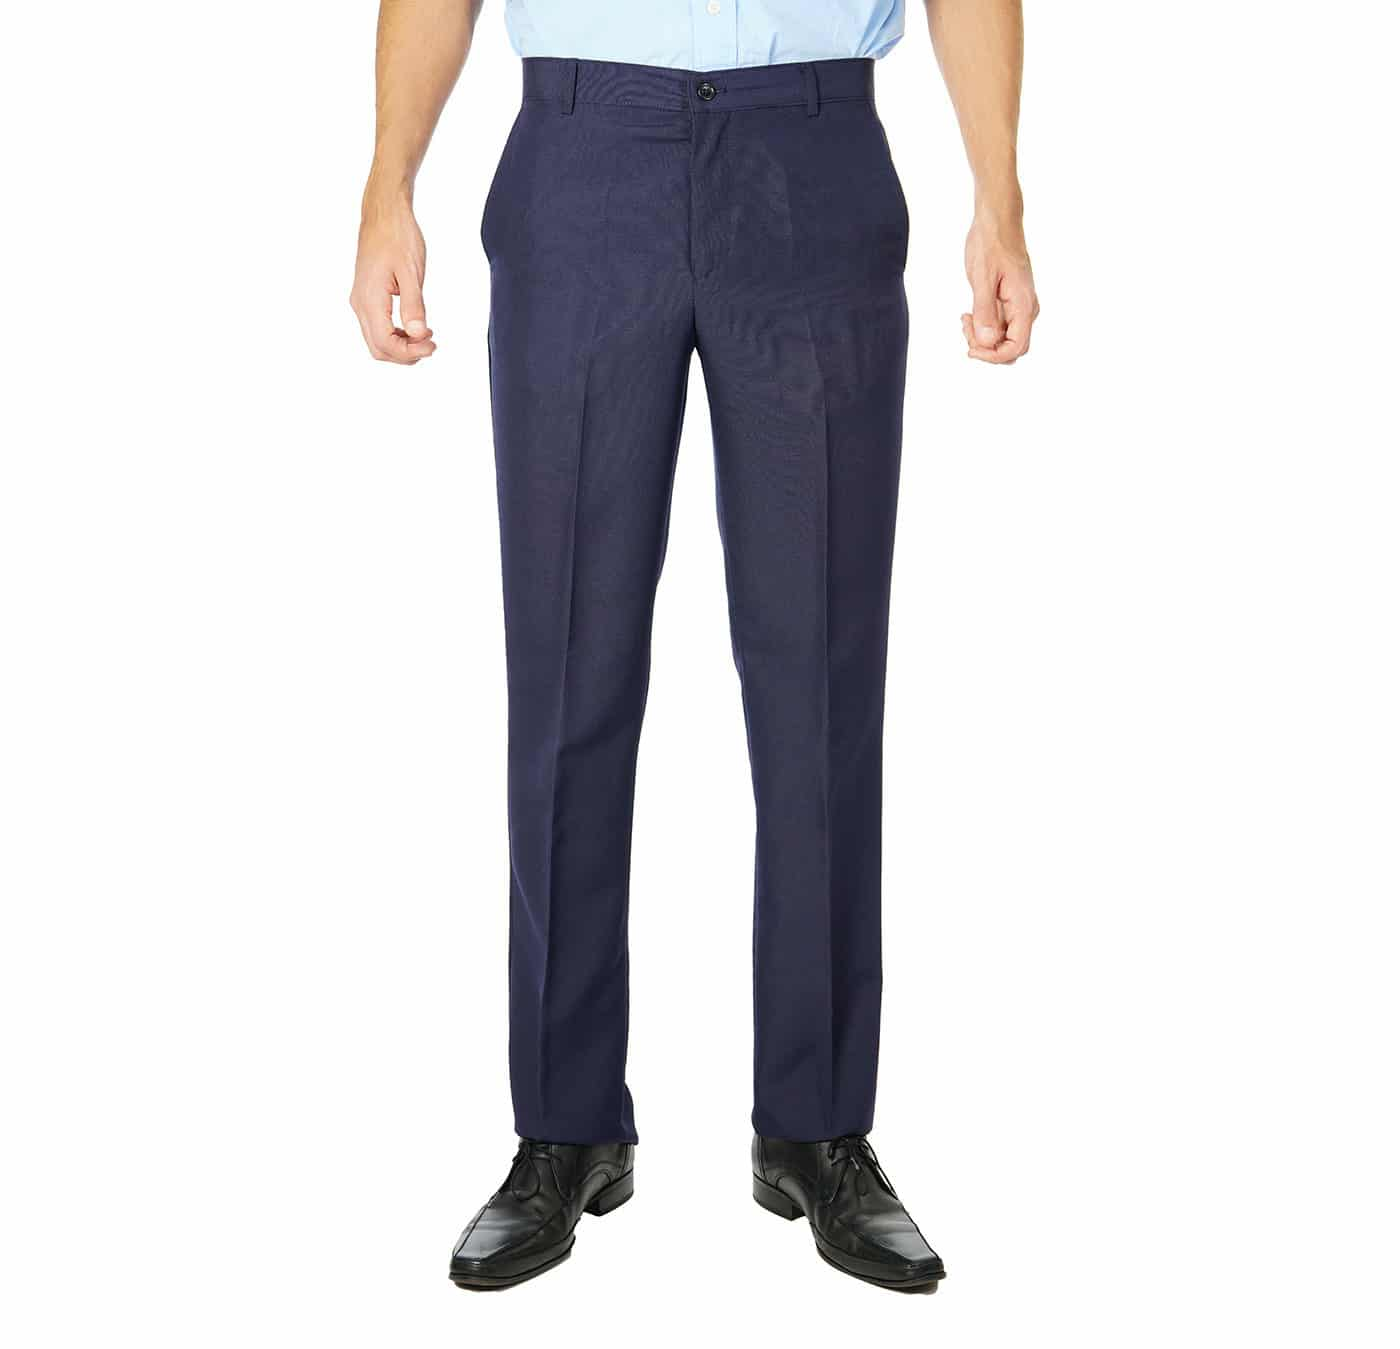 Pantalon Lino Stretch Hombre Uniformes Ejecutivos Para Hombre Uniformes Para Oficina